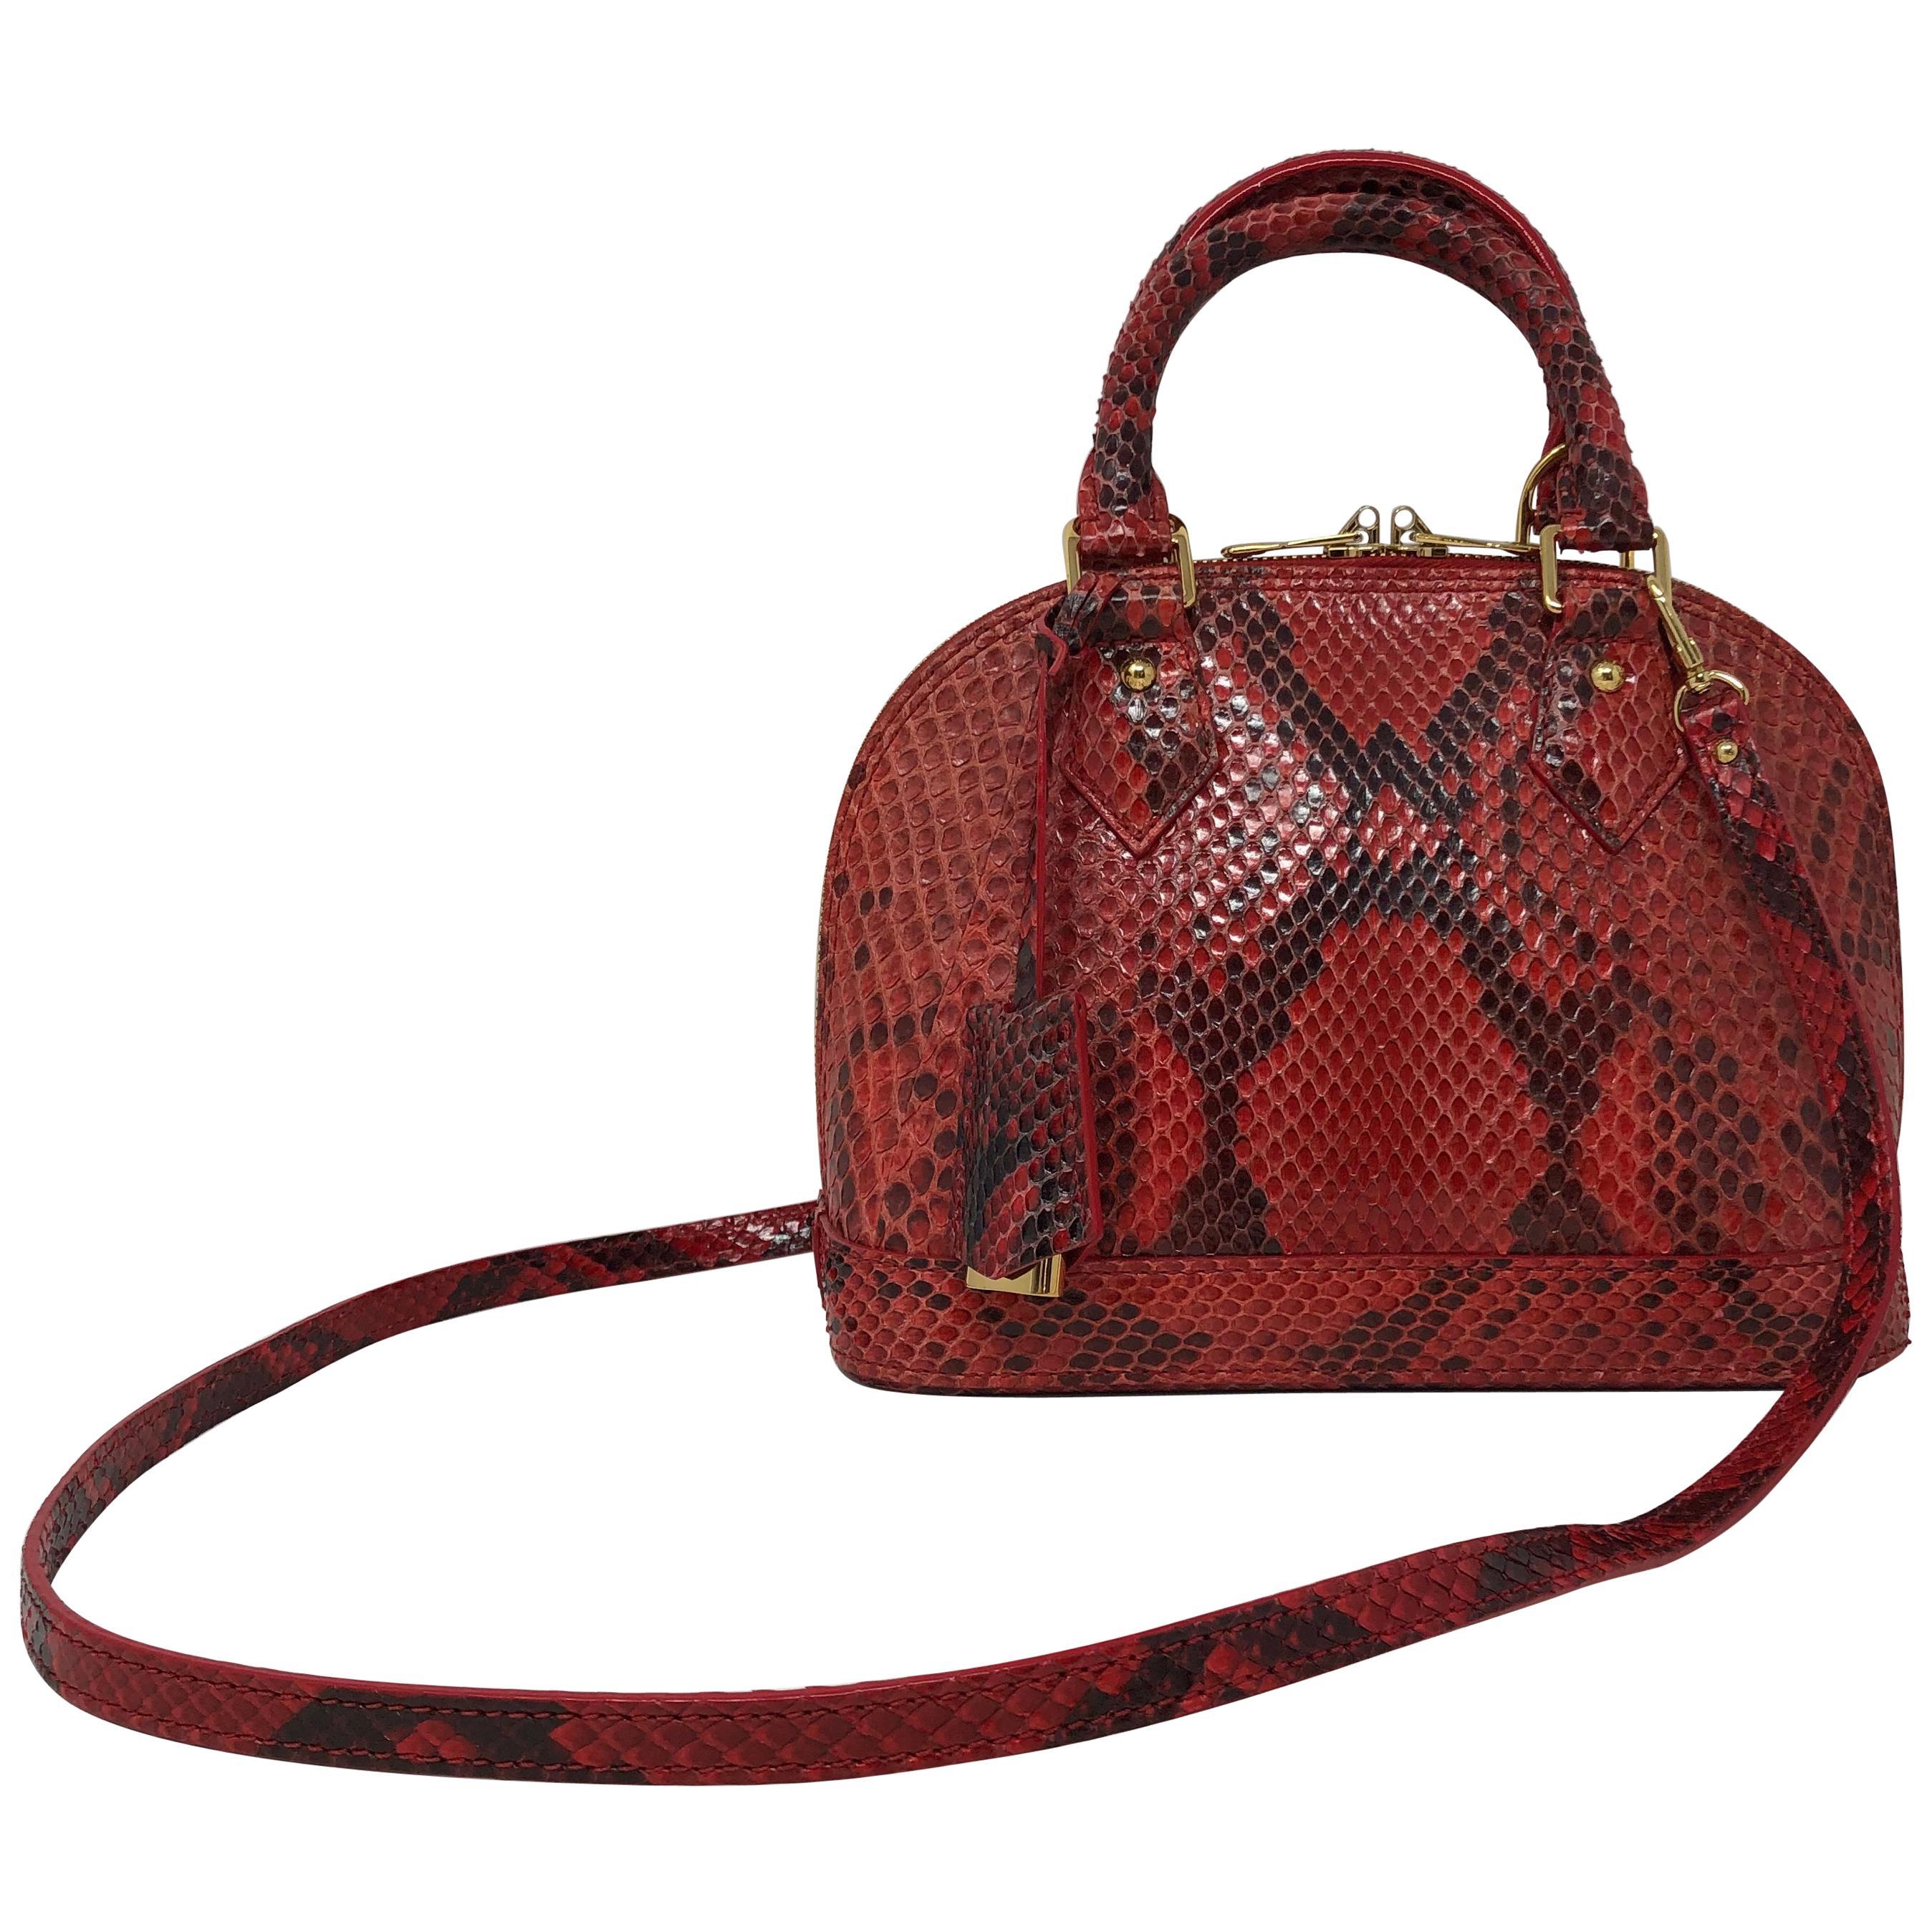 Louis Vuitton Red and Black Python Alma BB Crossbody Bag